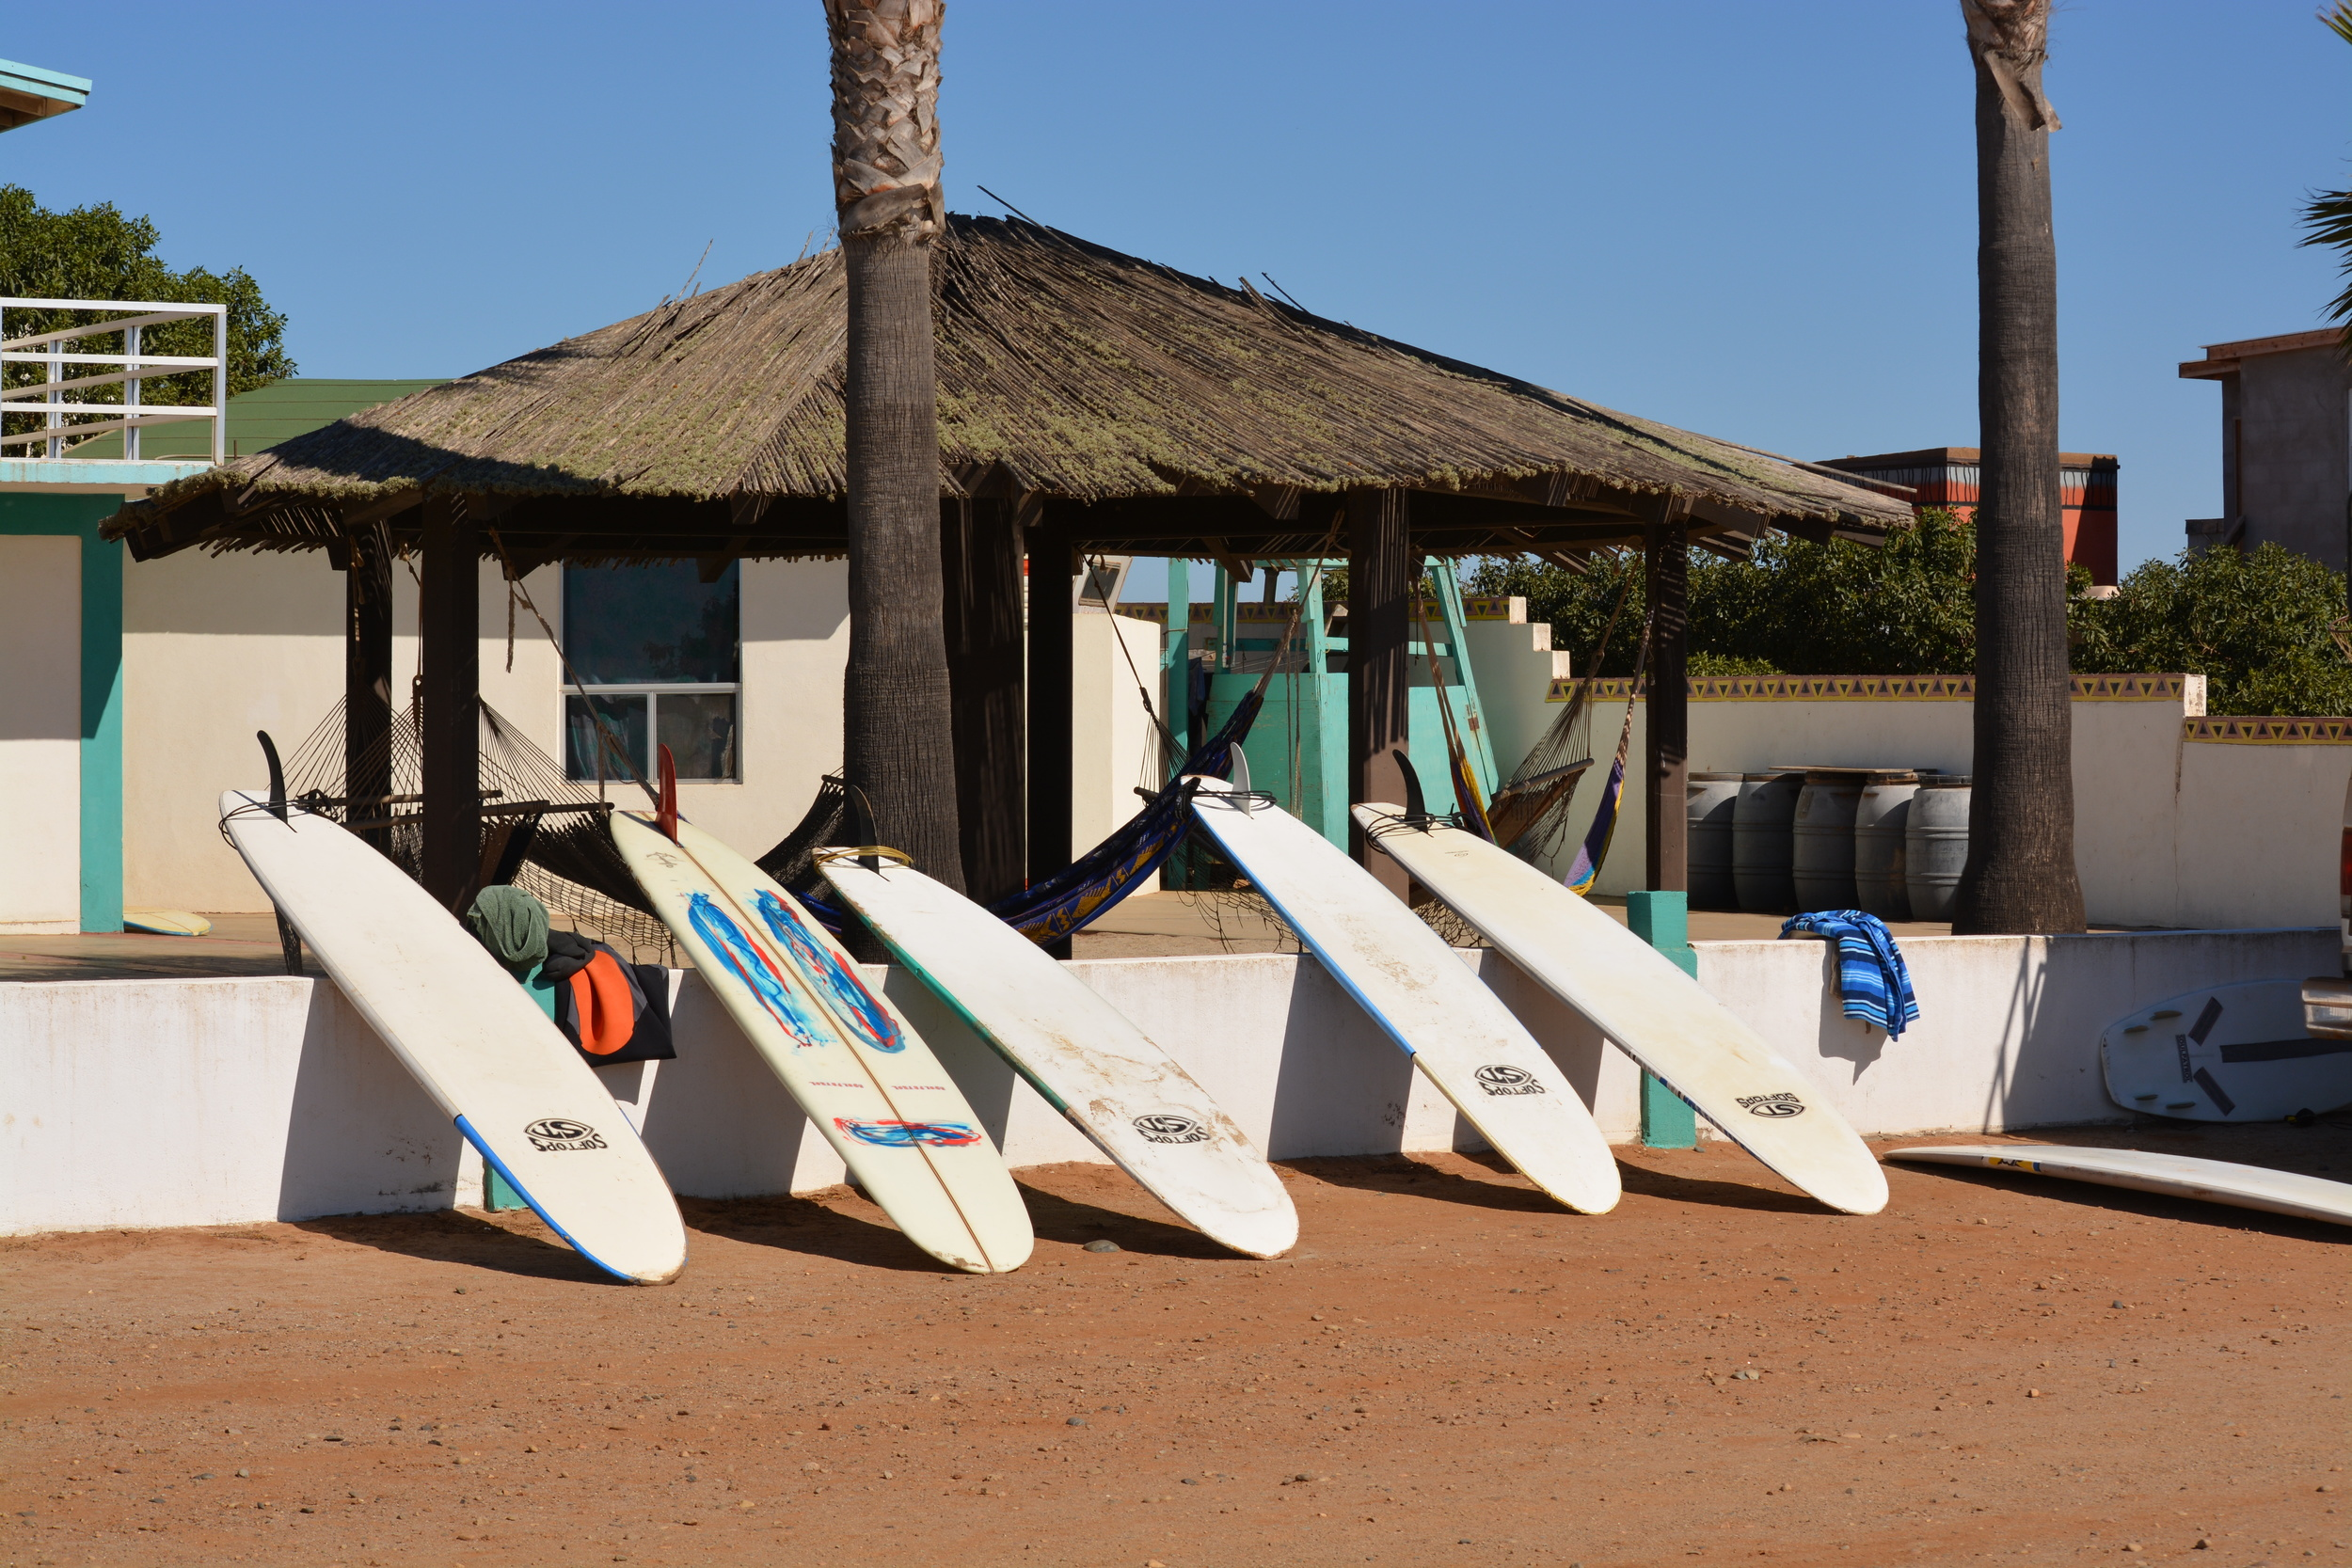 Baja California 10-5-13 Shipwrecks Surfing Adventure Ocean Experience Surf School San Diego (59).JPG